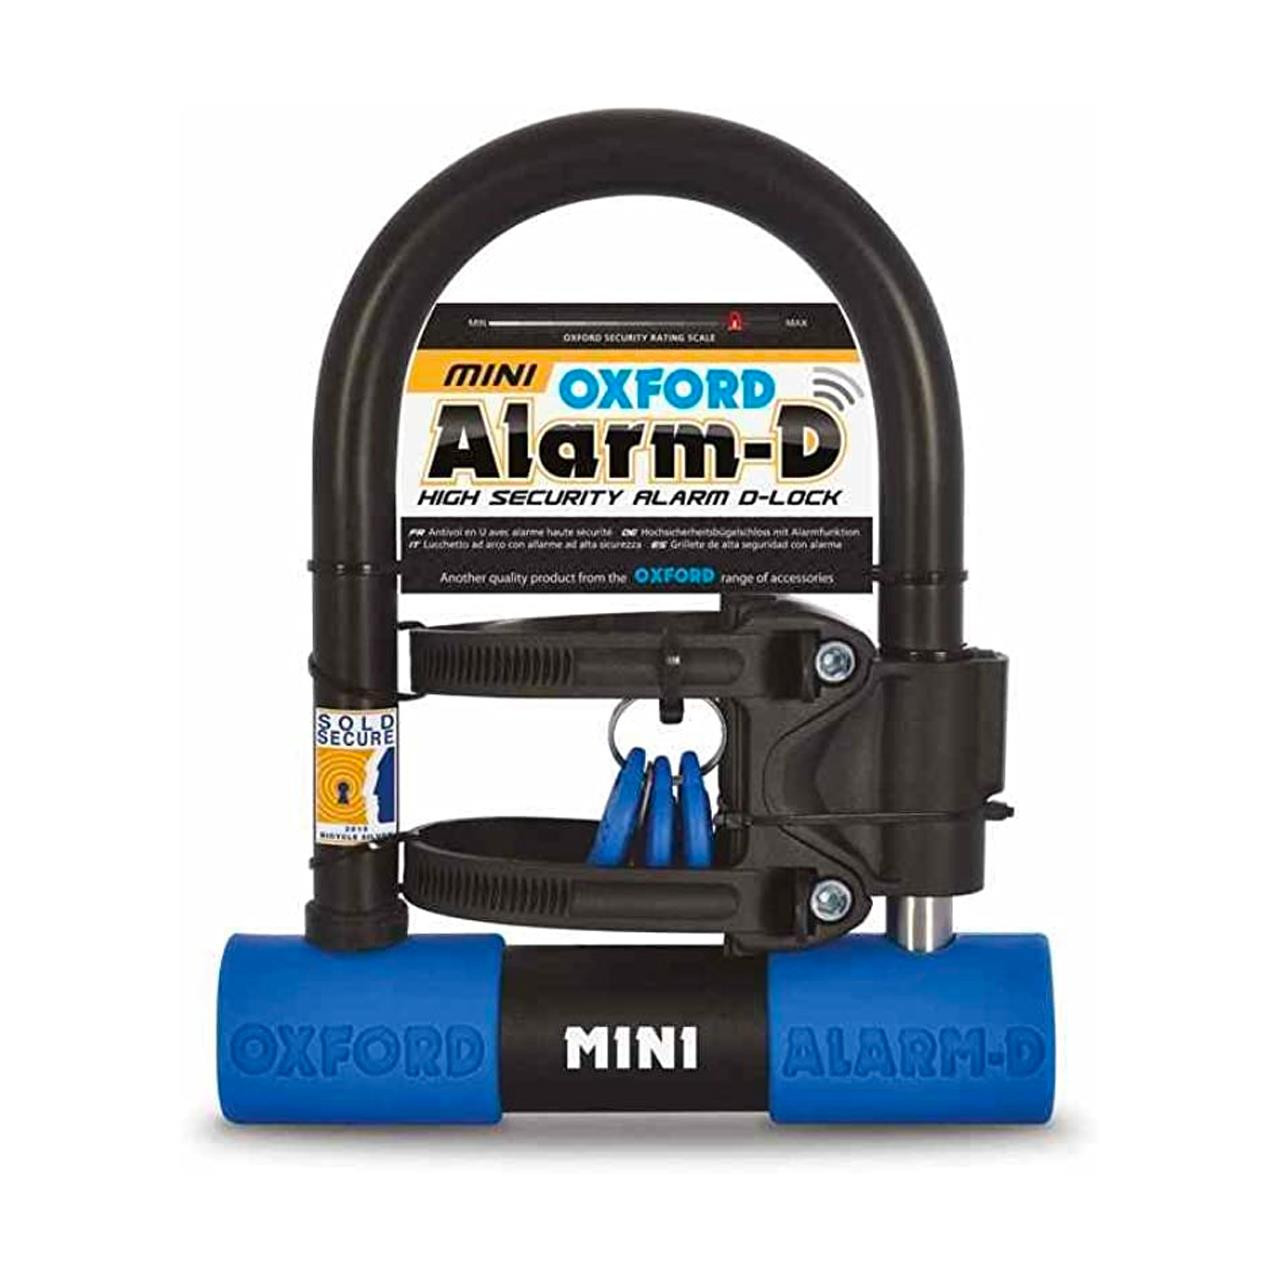 Oxford D Mini Alarmed Shackle (Black/Blue)